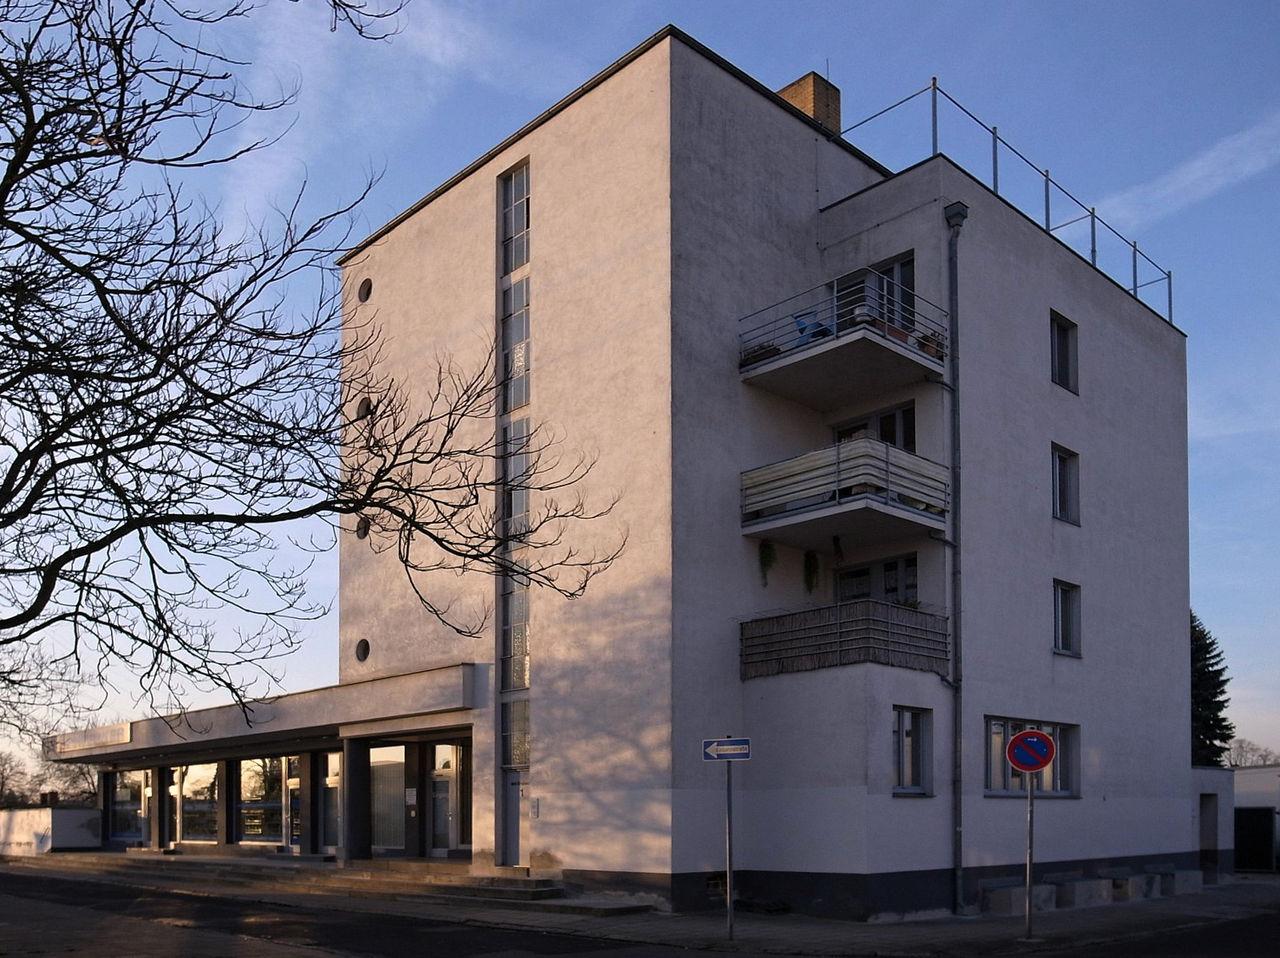 Bild Konsumgebäude Dessau Törten